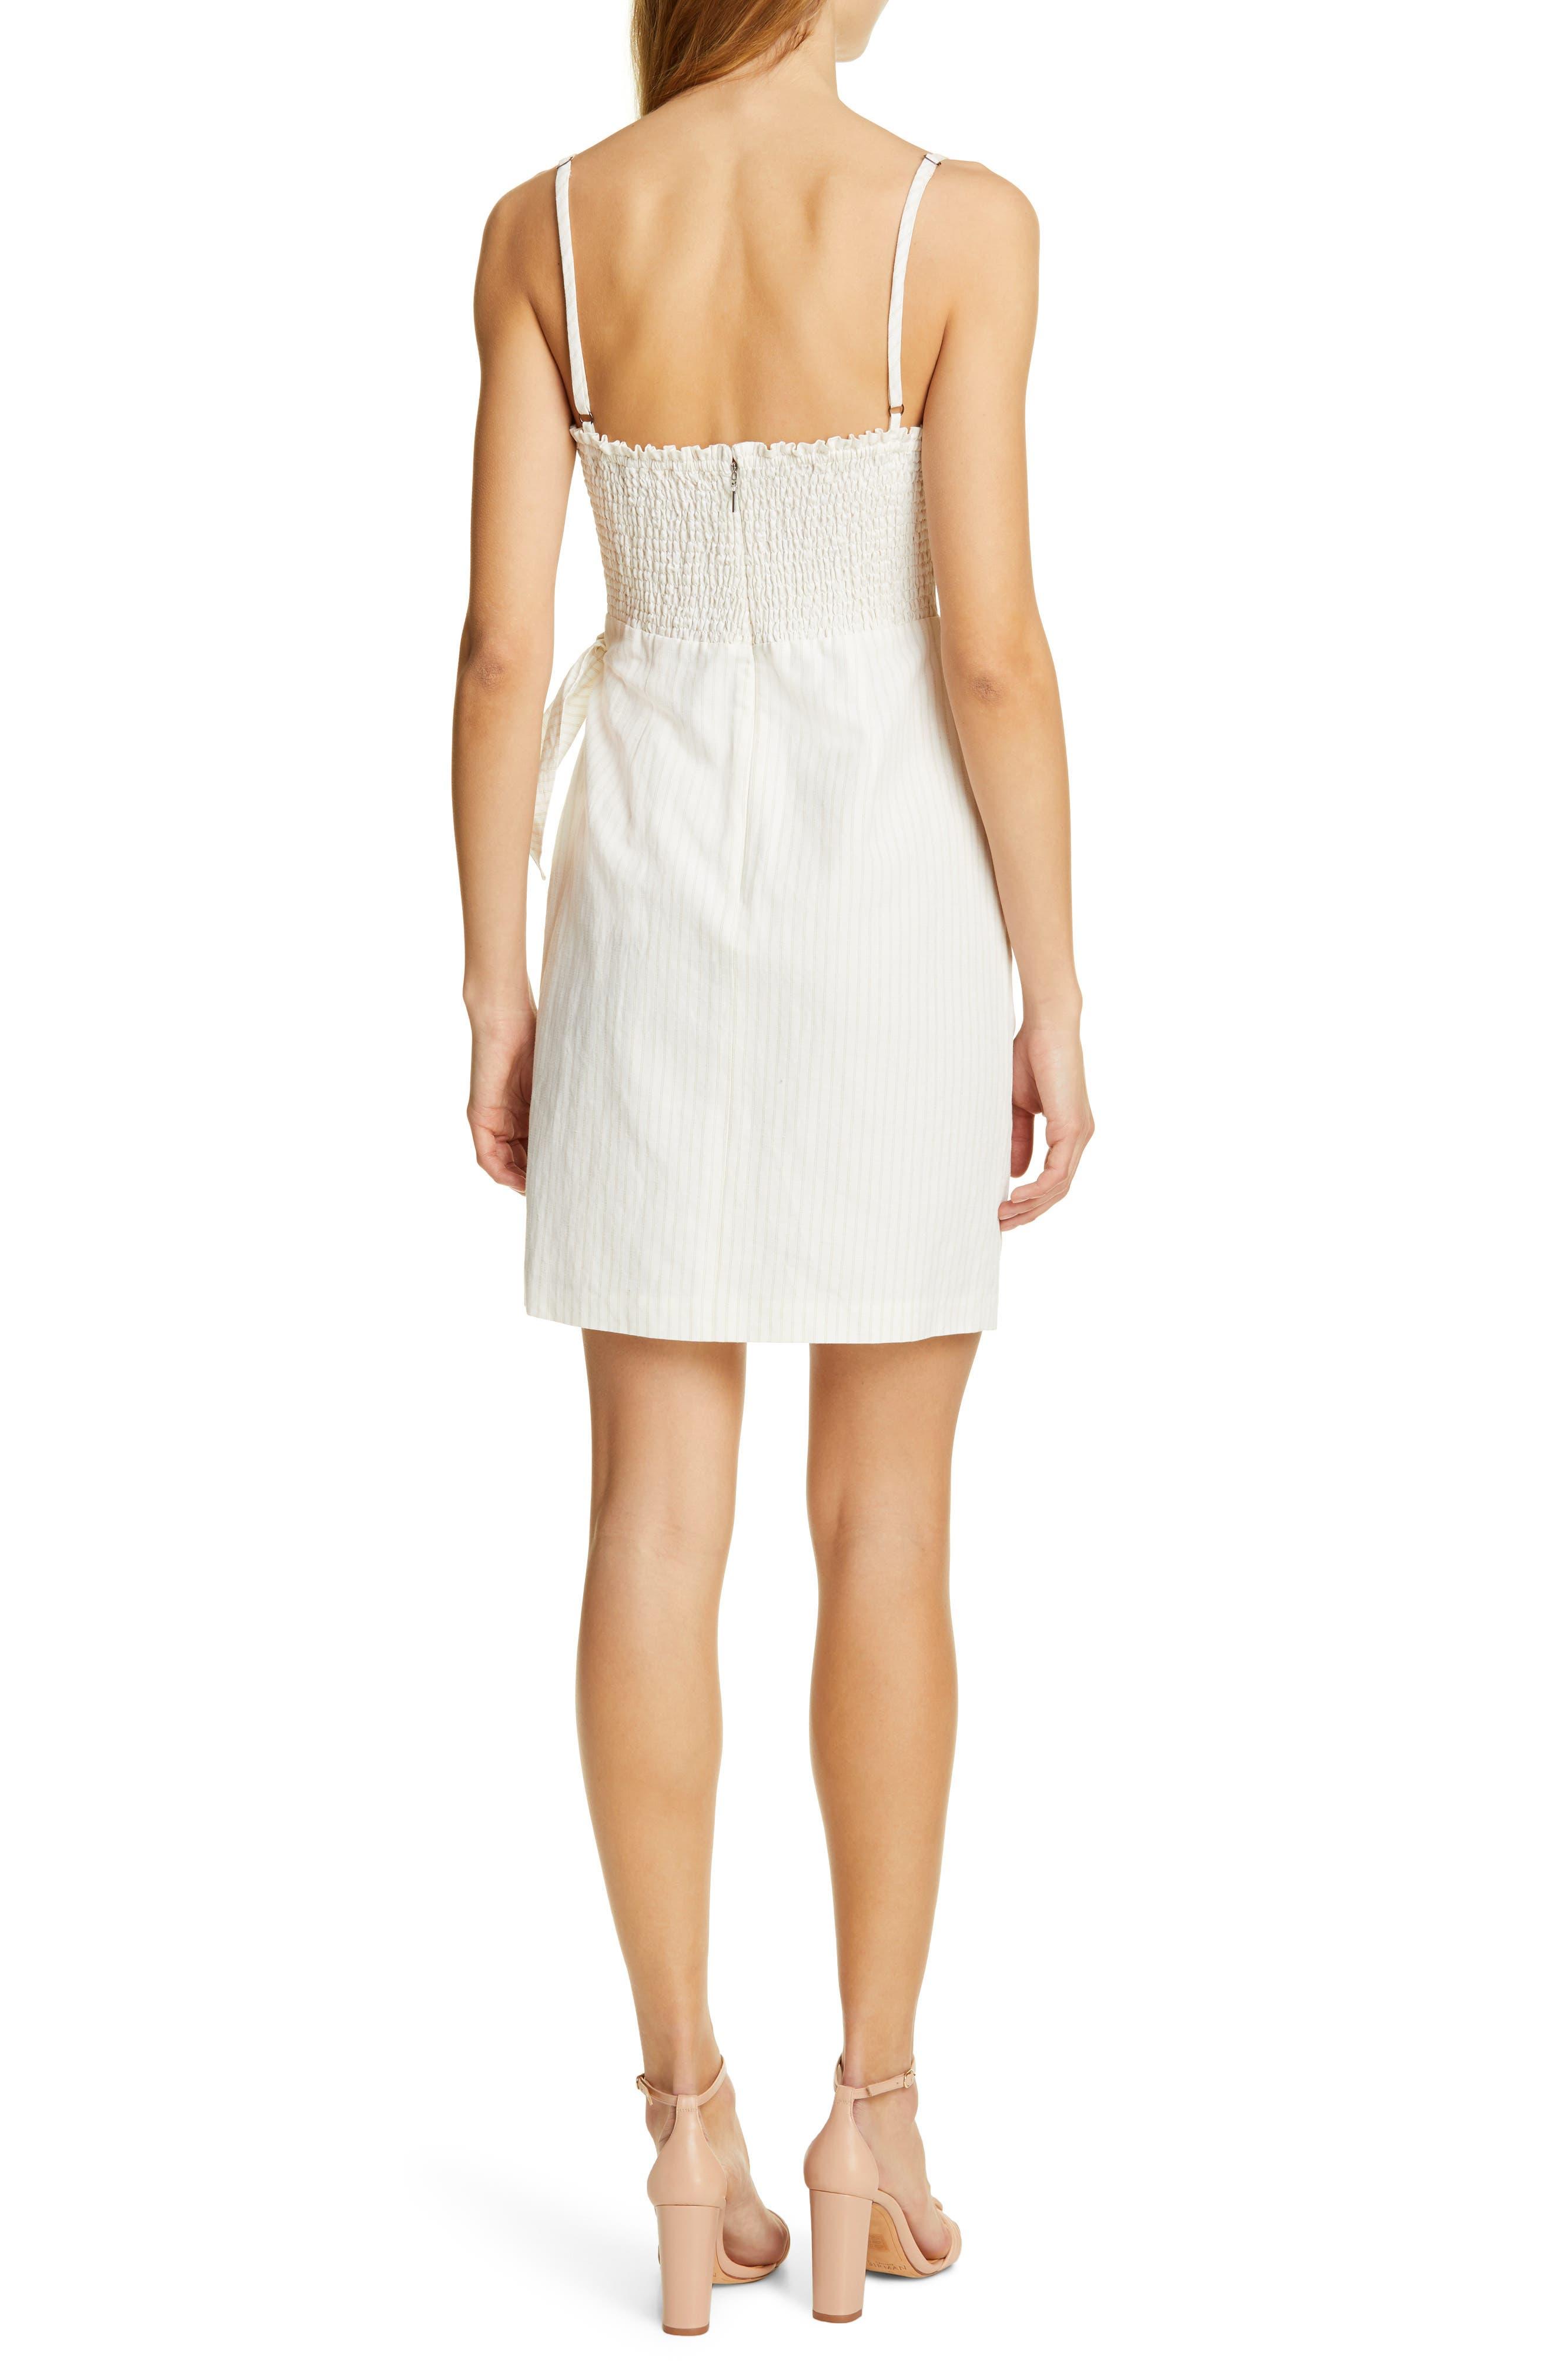 REBECCA TAYLOR, Pinstripe Cotton & Linen Dress, Alternate thumbnail 2, color, SNOW COMBO